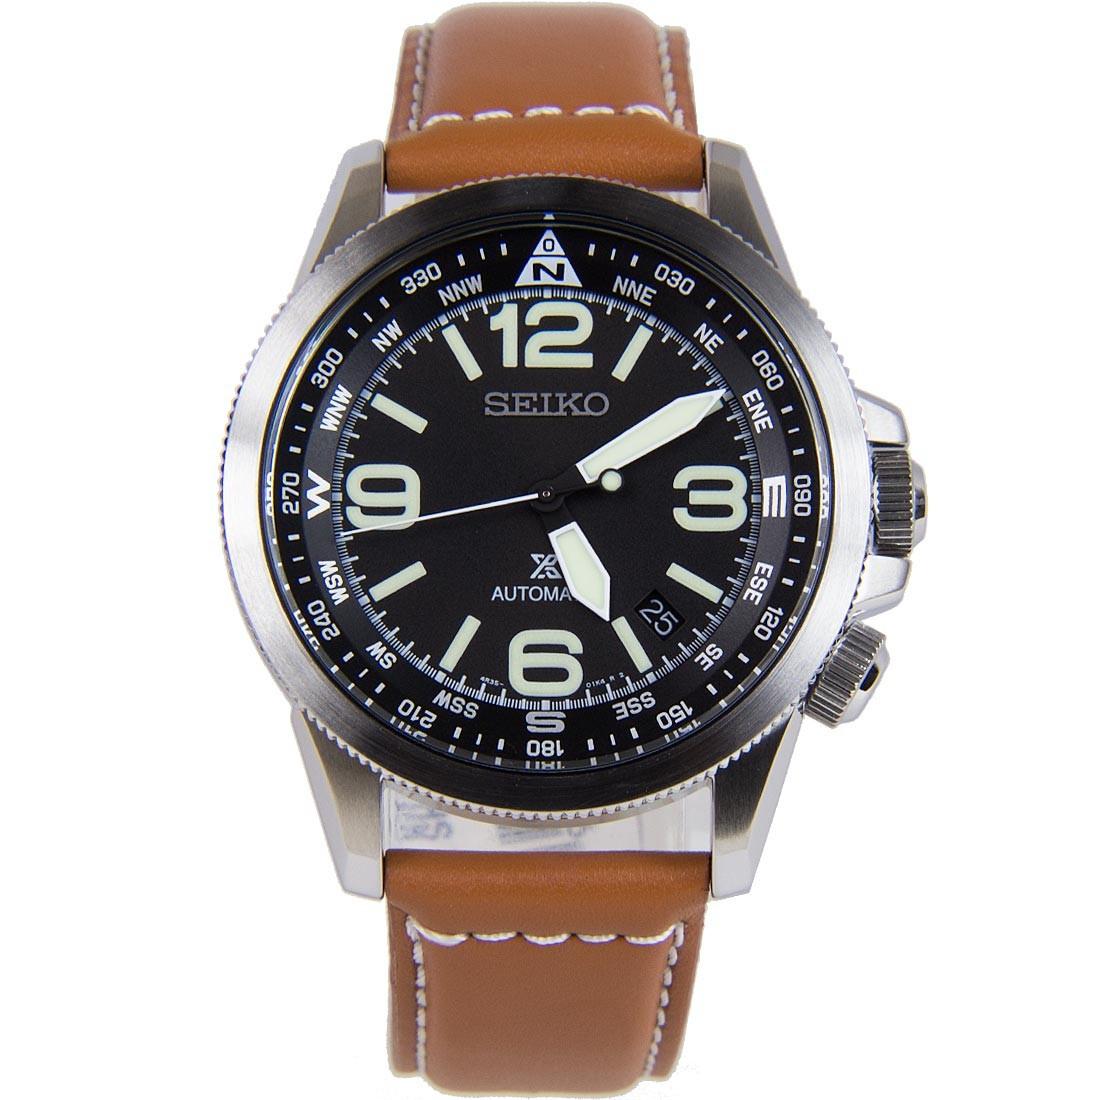 Часы Seiko SRPA75K1 Prospex 4R35 Automatic